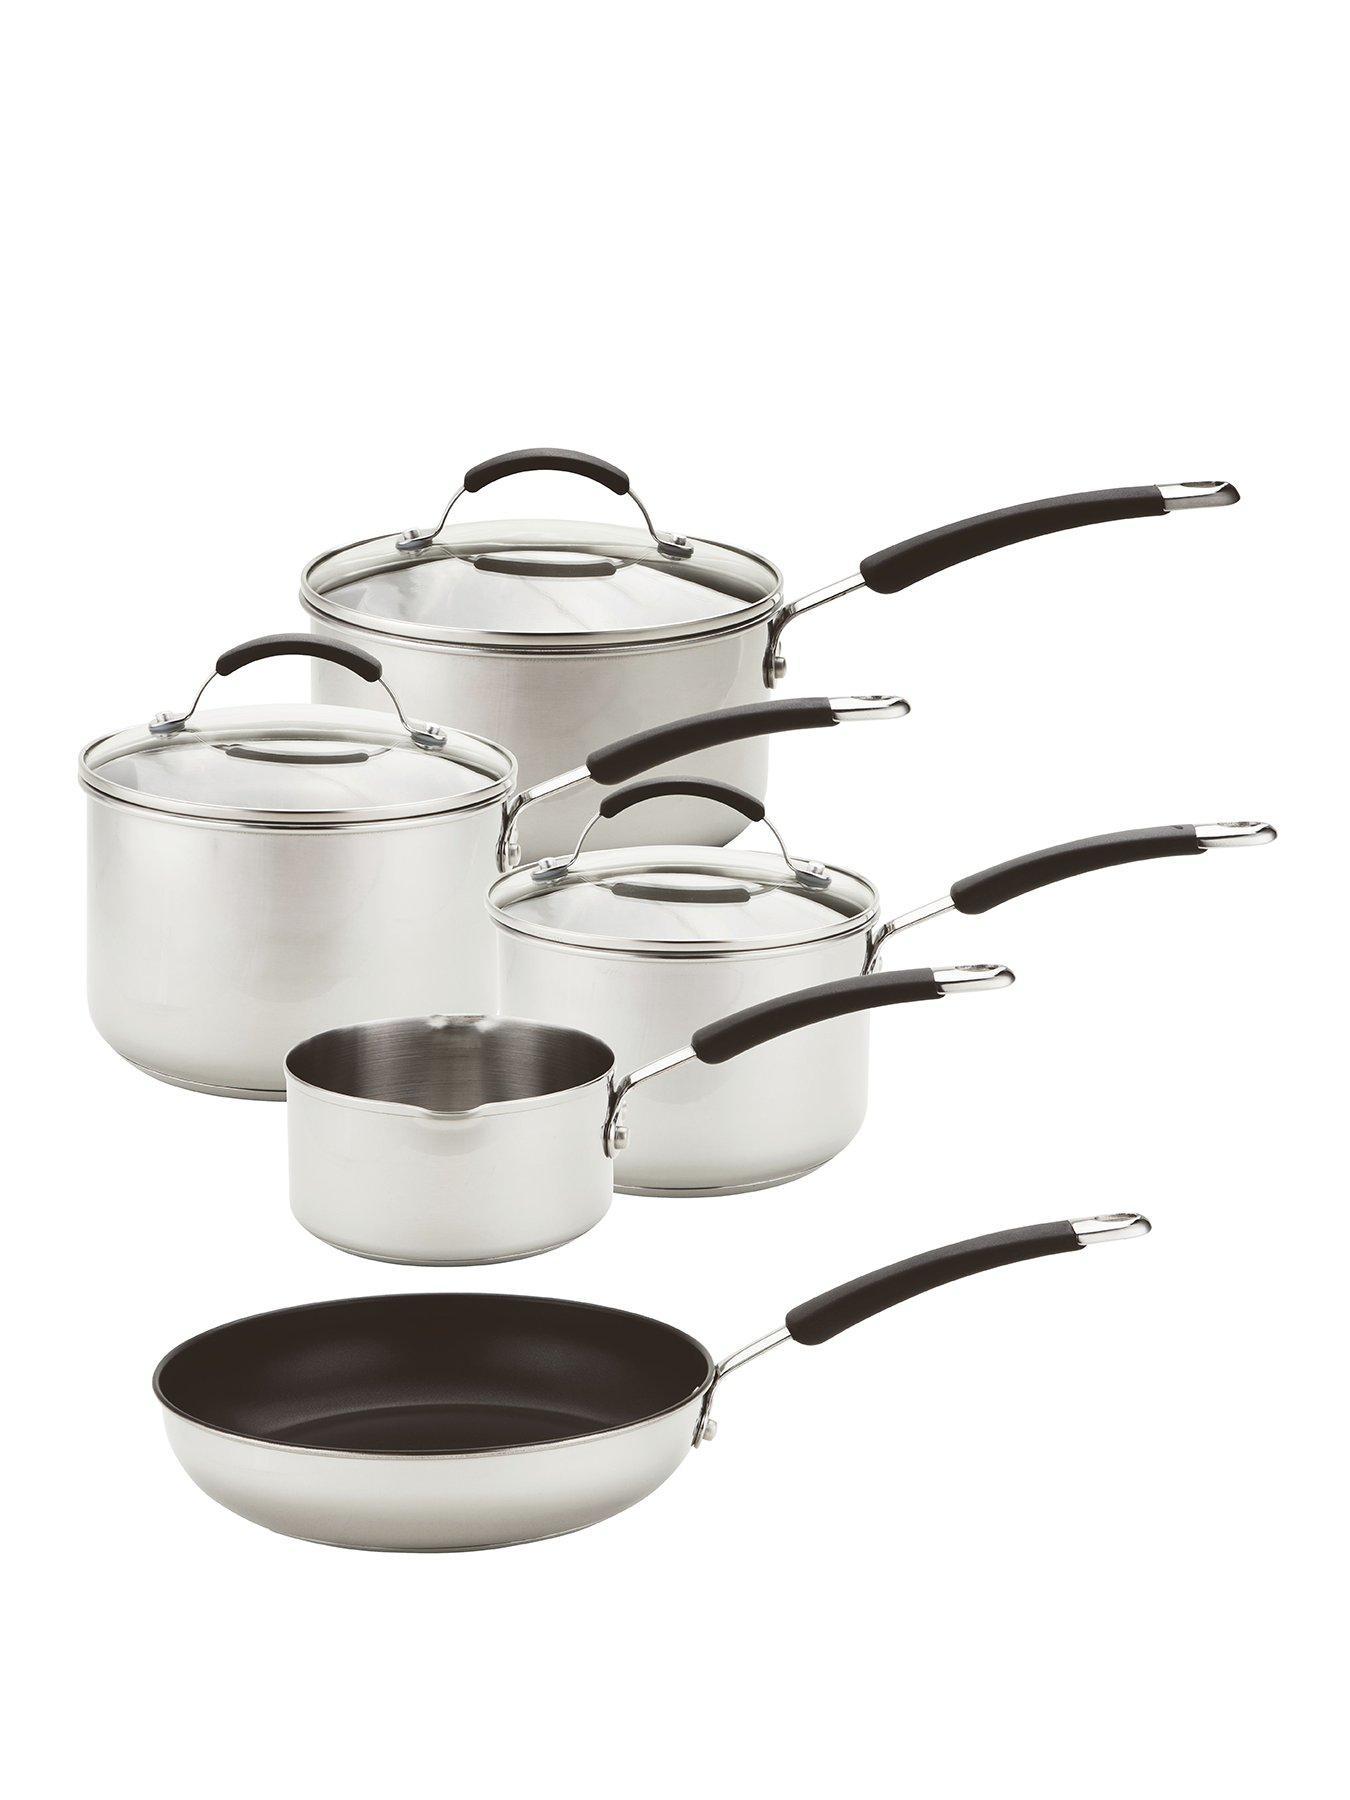 8 Pcs Induction Hob Stainless Steel Saucepan Casserole Pot Dining Cookware Set